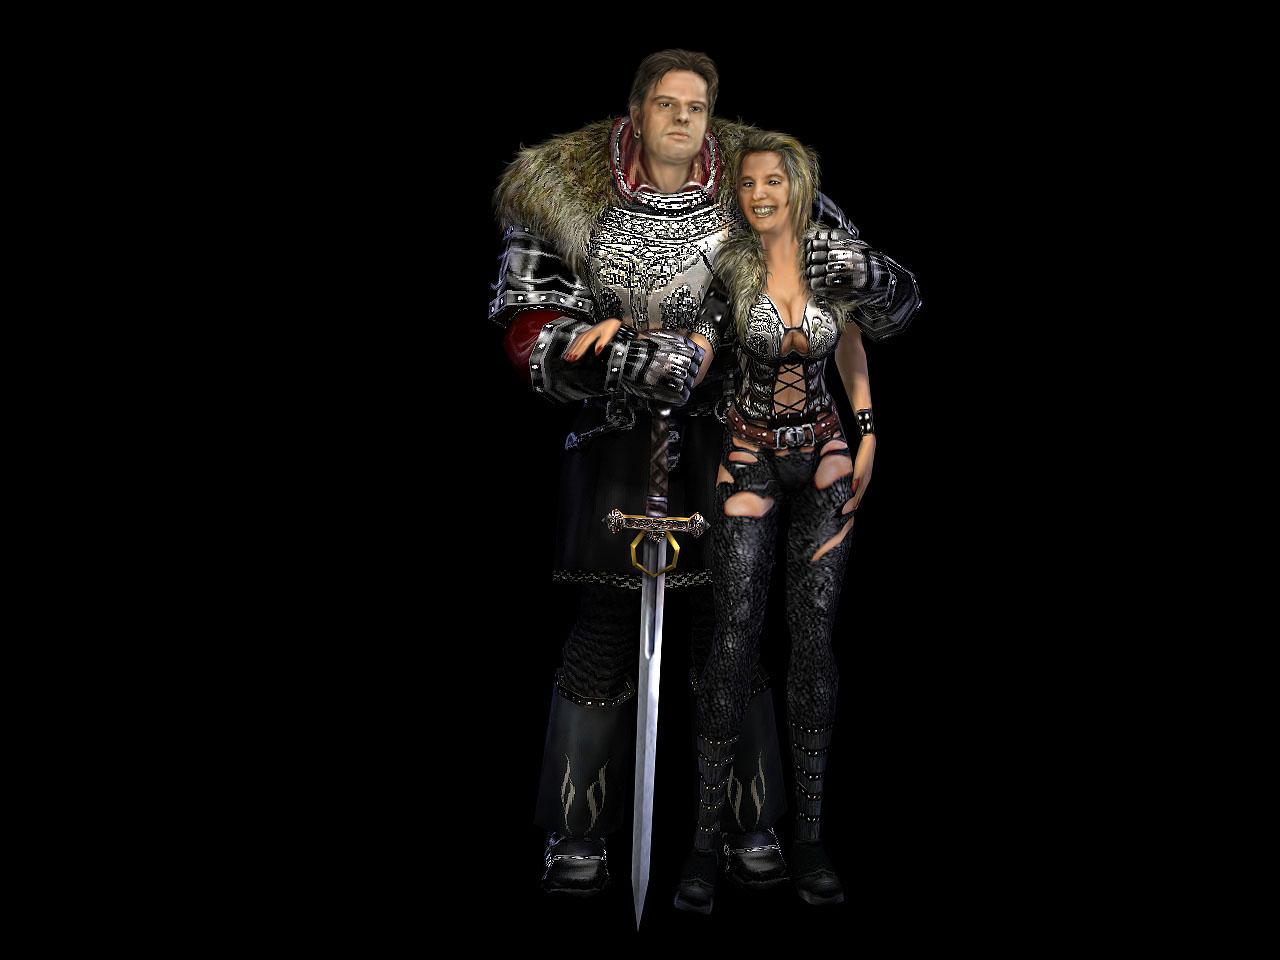 Refined Putzki as Orebaron with Ex-Wife